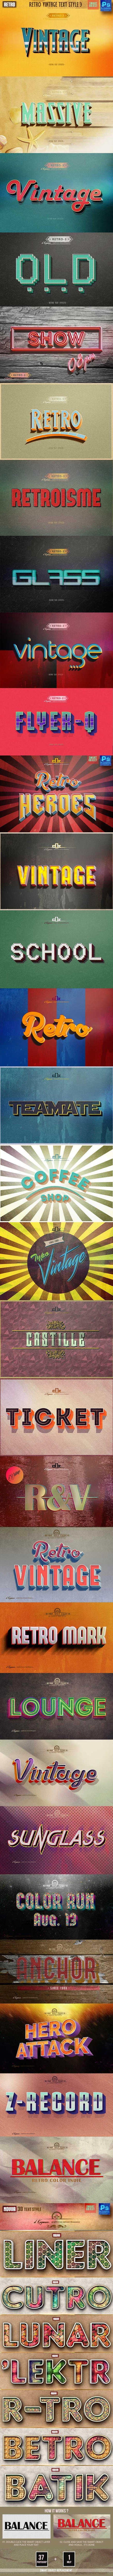 37 Retro & Vintage Style Bundle